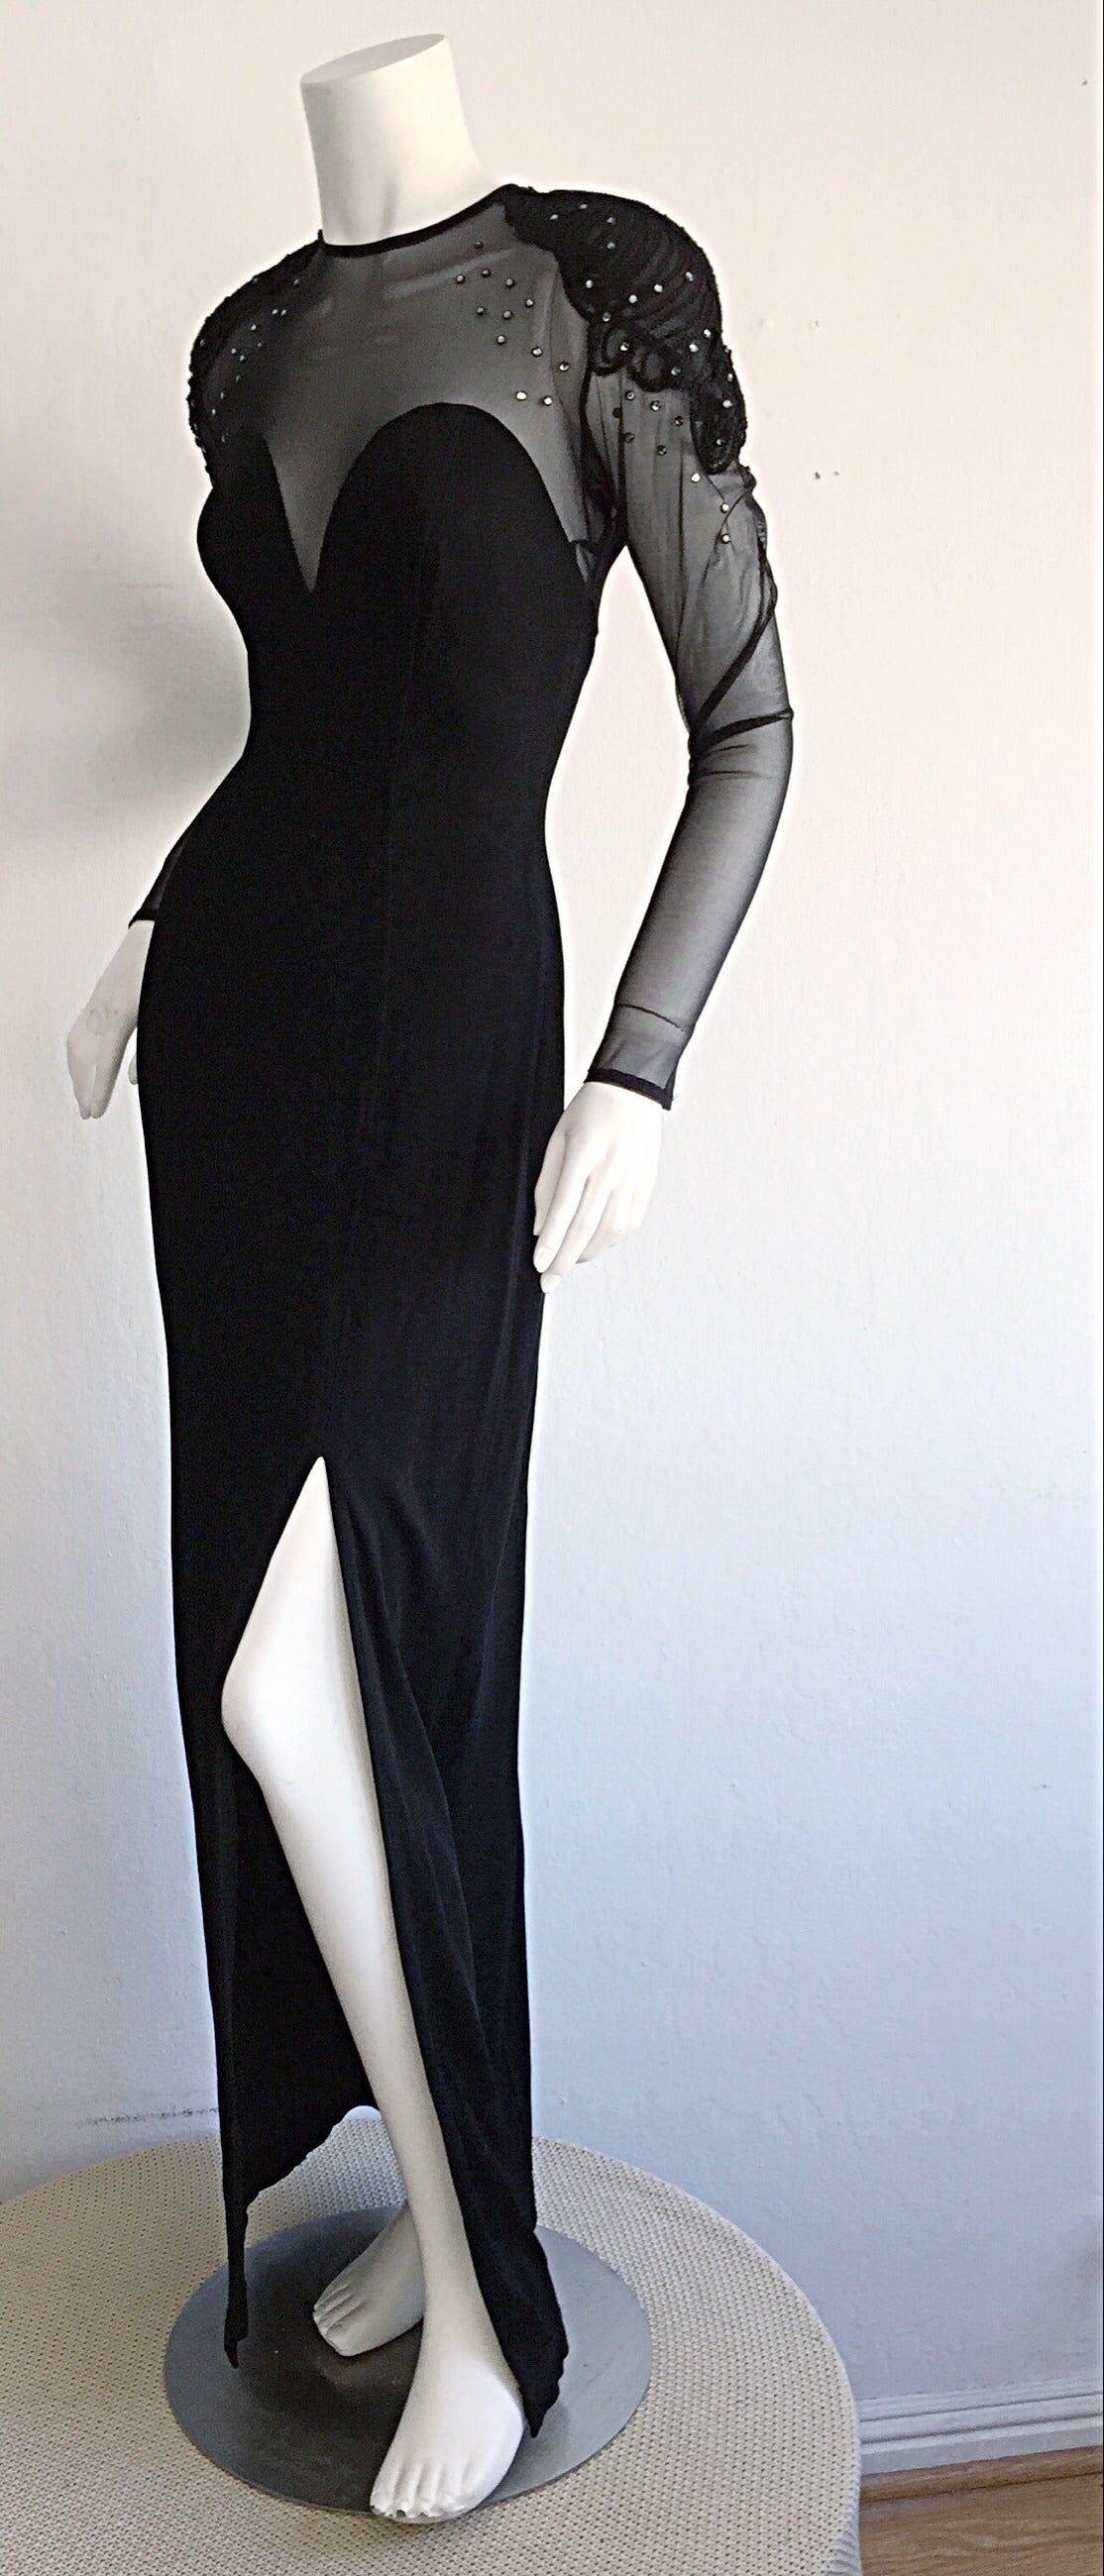 Sexy Vintage 1990s Black Cut - Out Bodycon Dress w/ Rhinestones 6